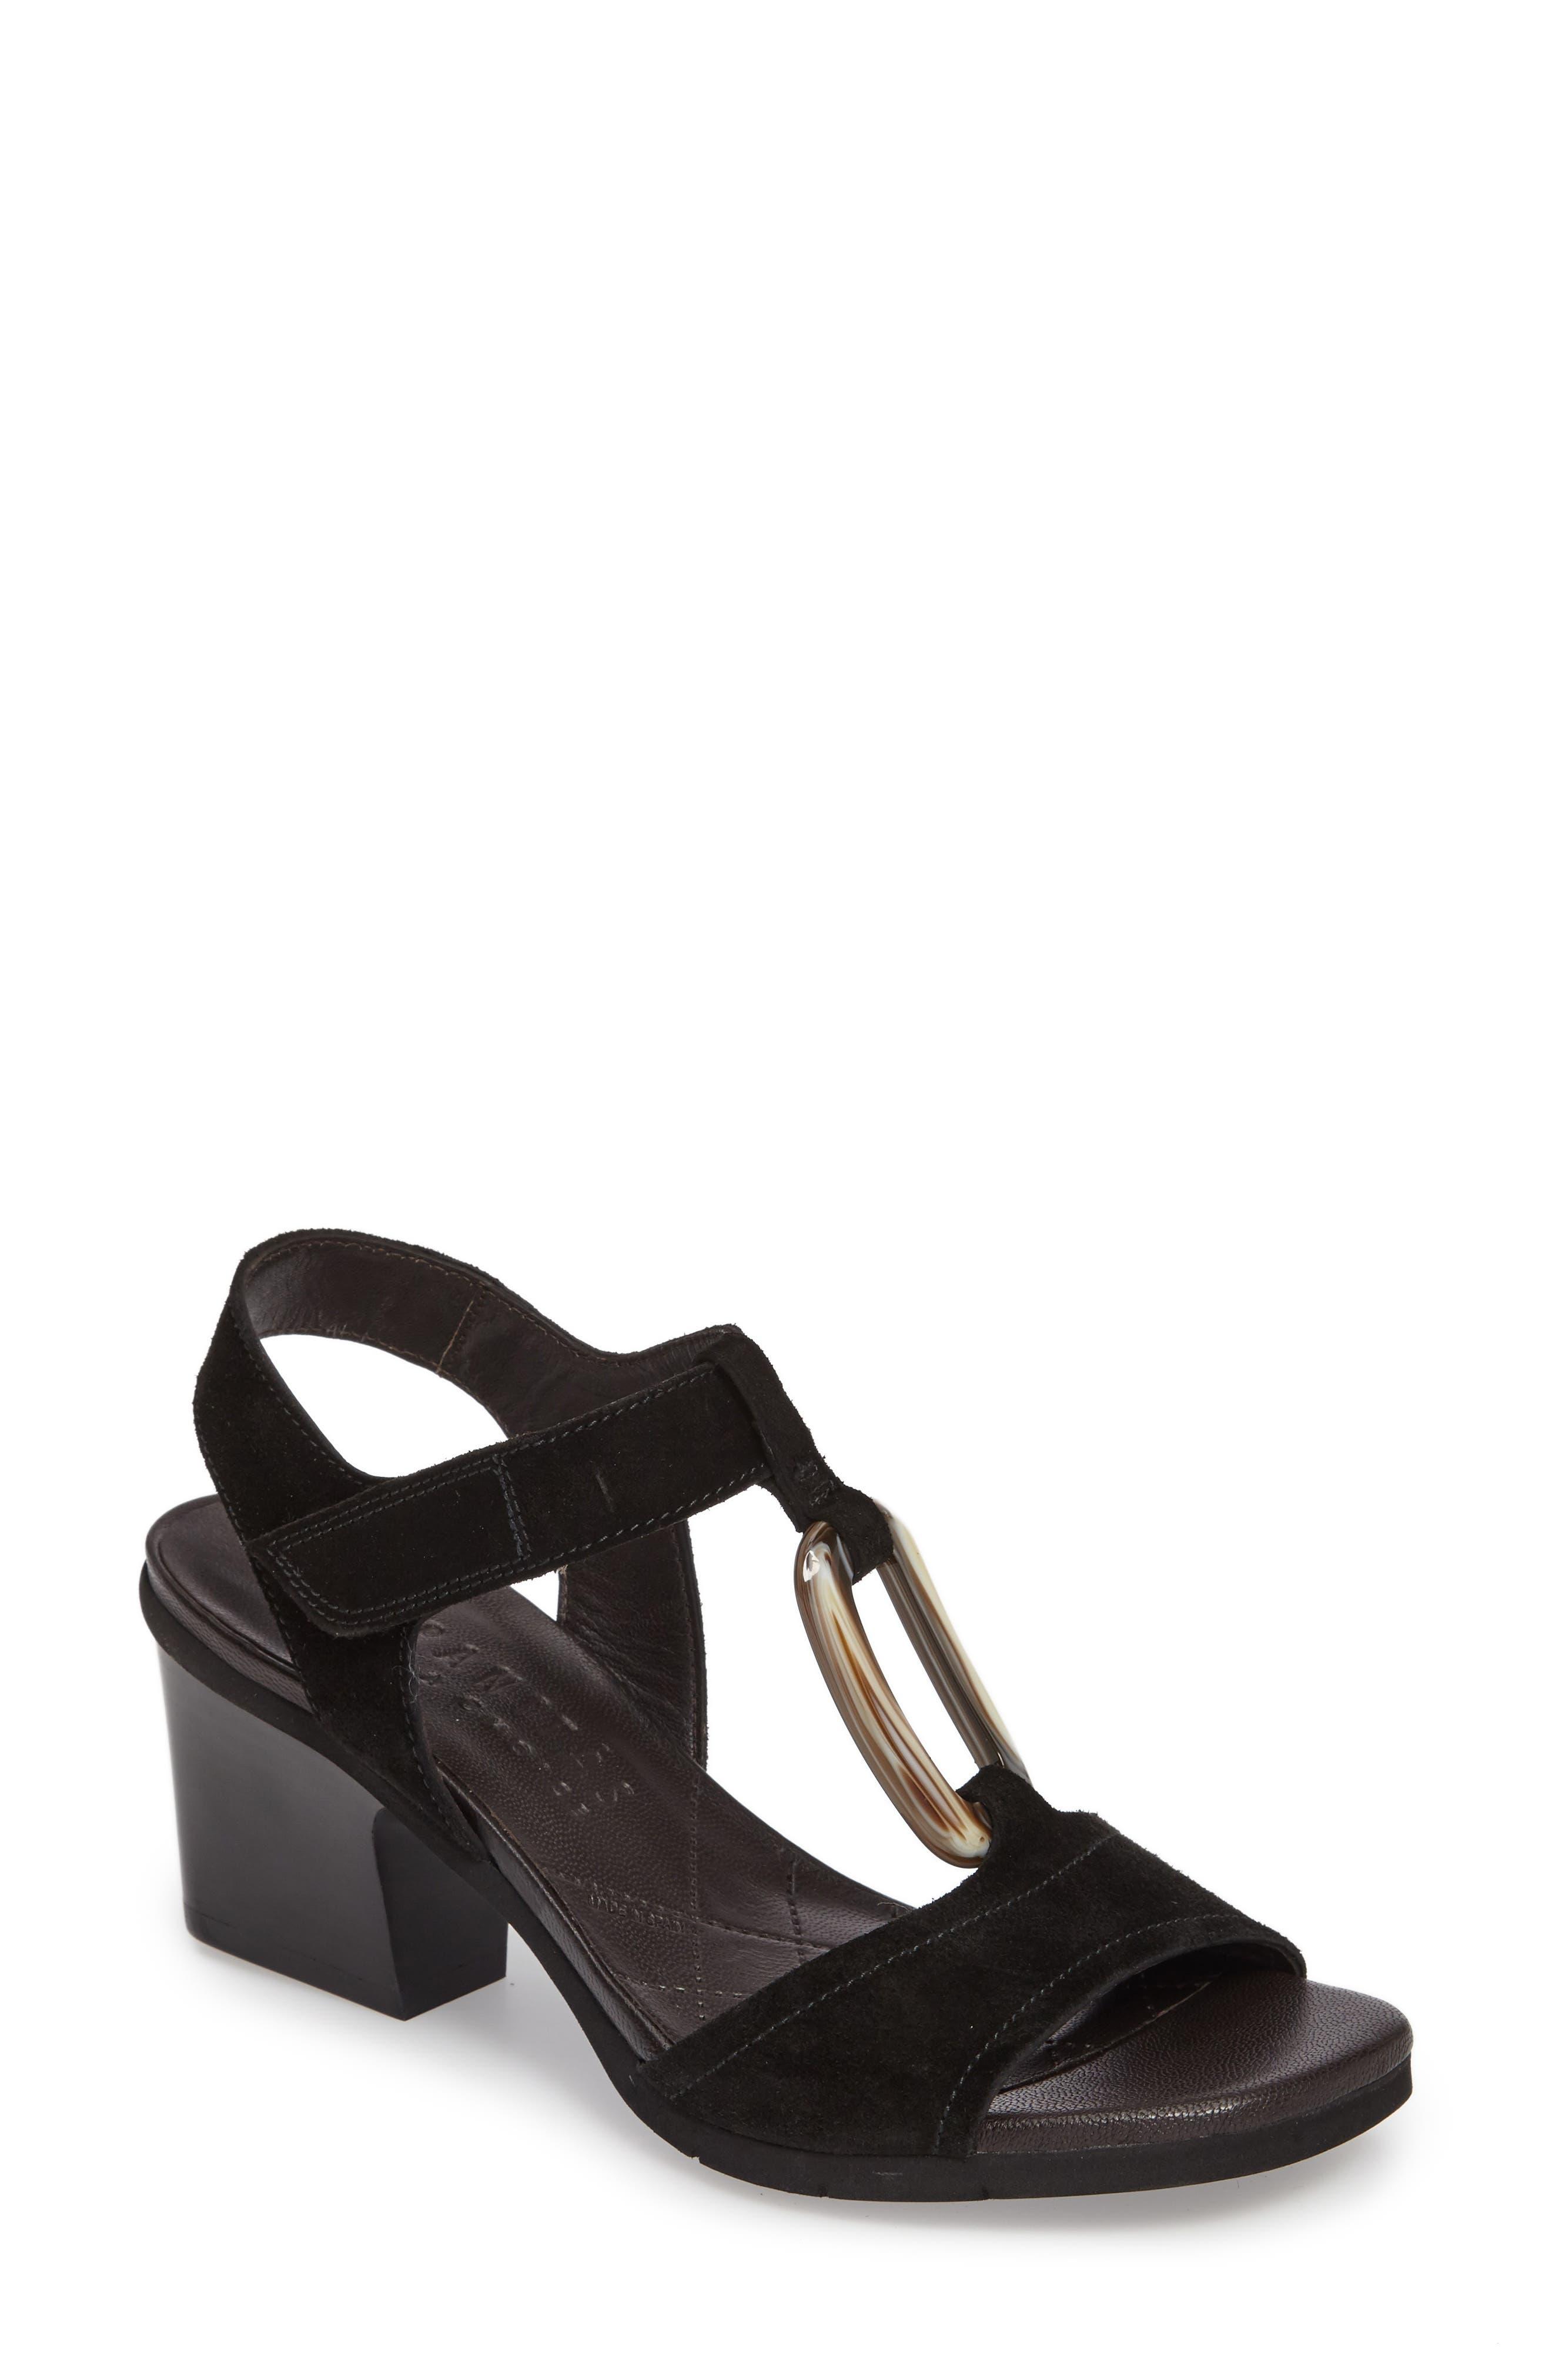 Ursula Ringed T-Strap Sandal,                         Main,                         color, 001